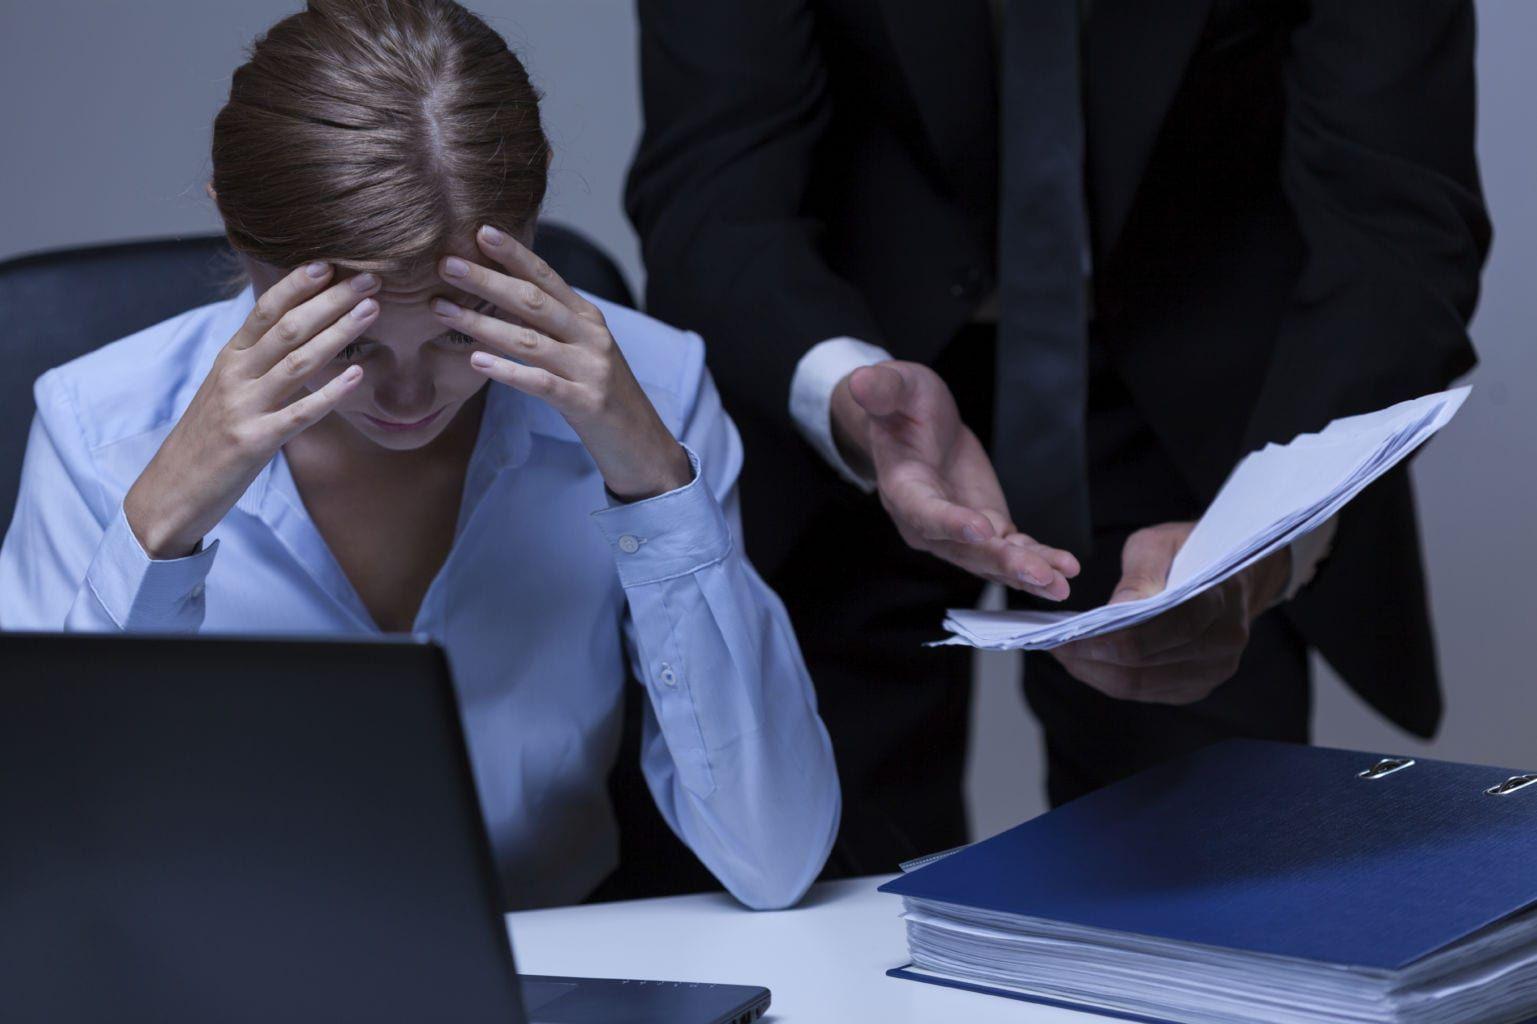 Blog-Employee-Harassment-1537x1024